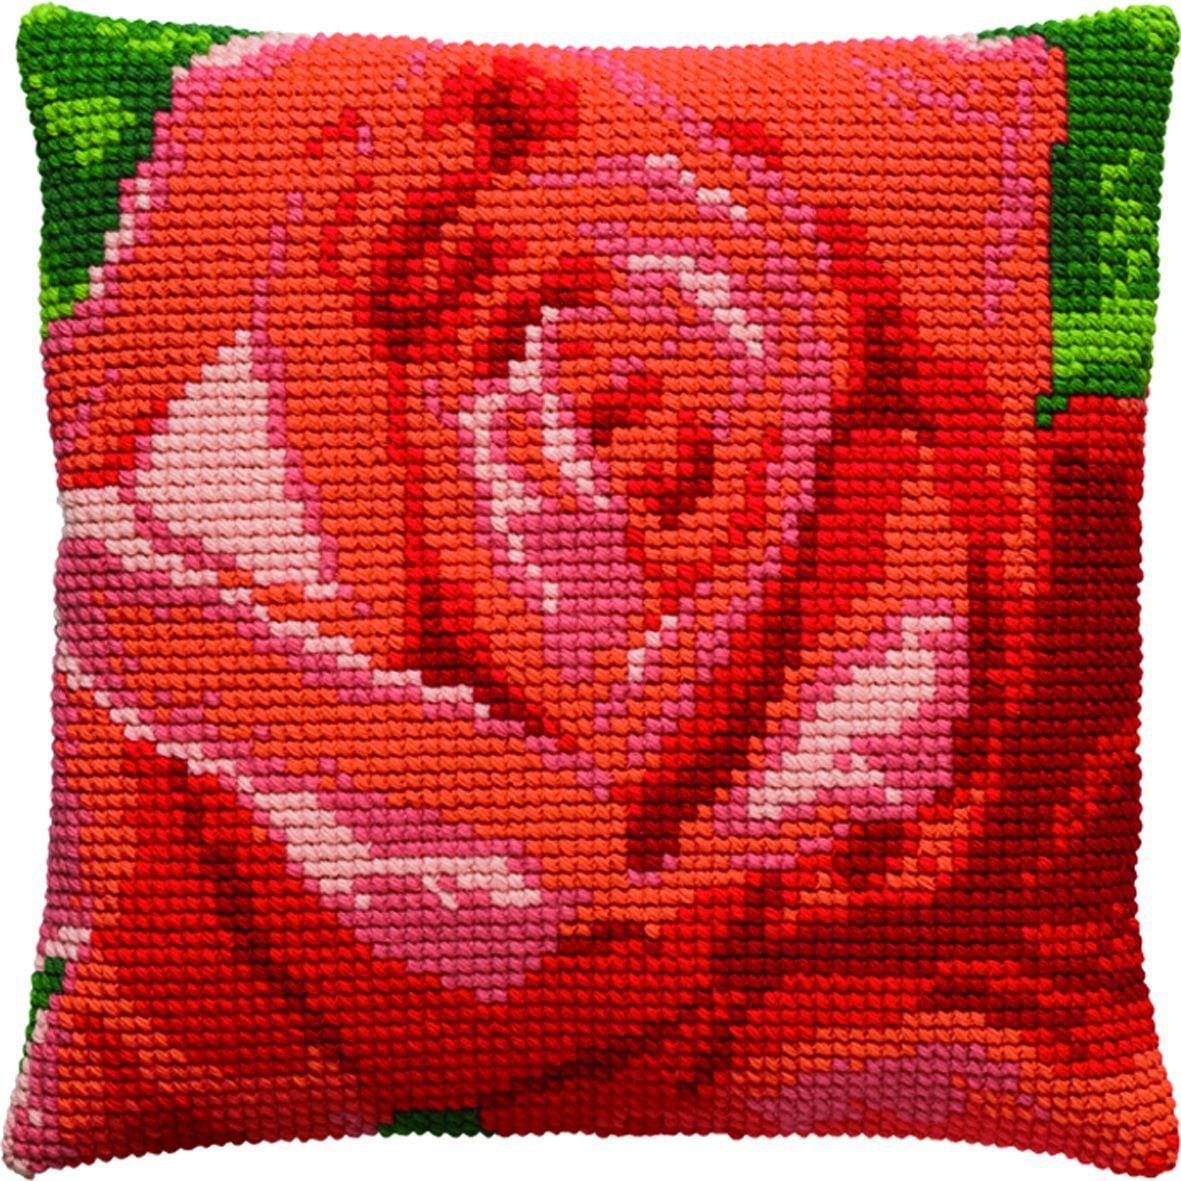 cross stitch cushion beautiful red rose printed